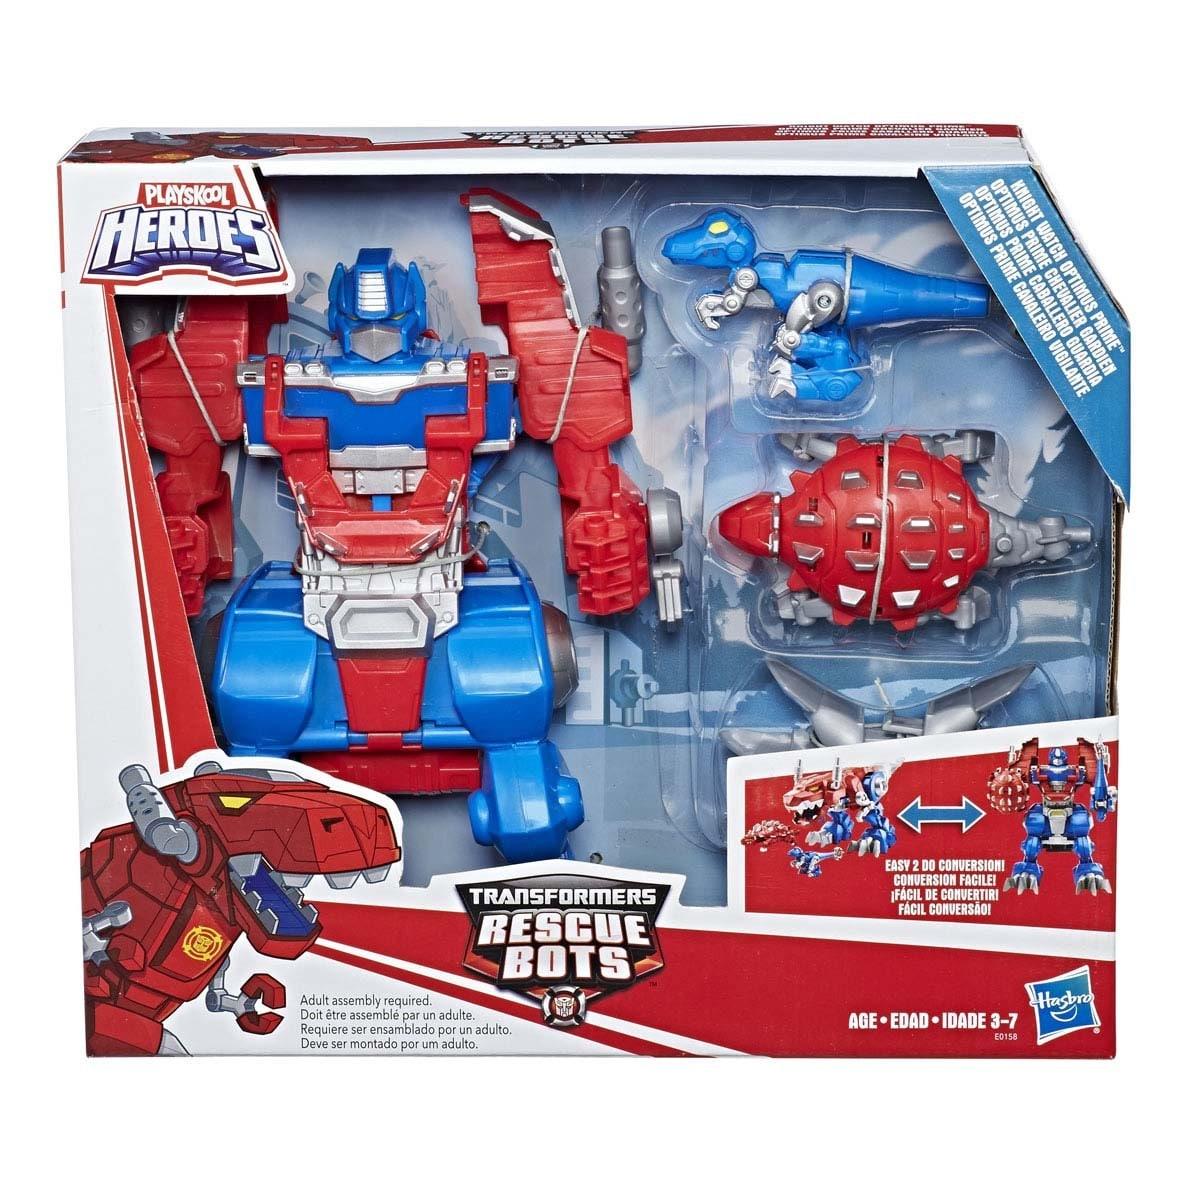 Optimus Guardia Transformers Prime Hasbro Heroes Playskool Caballero nwv8Nm0O